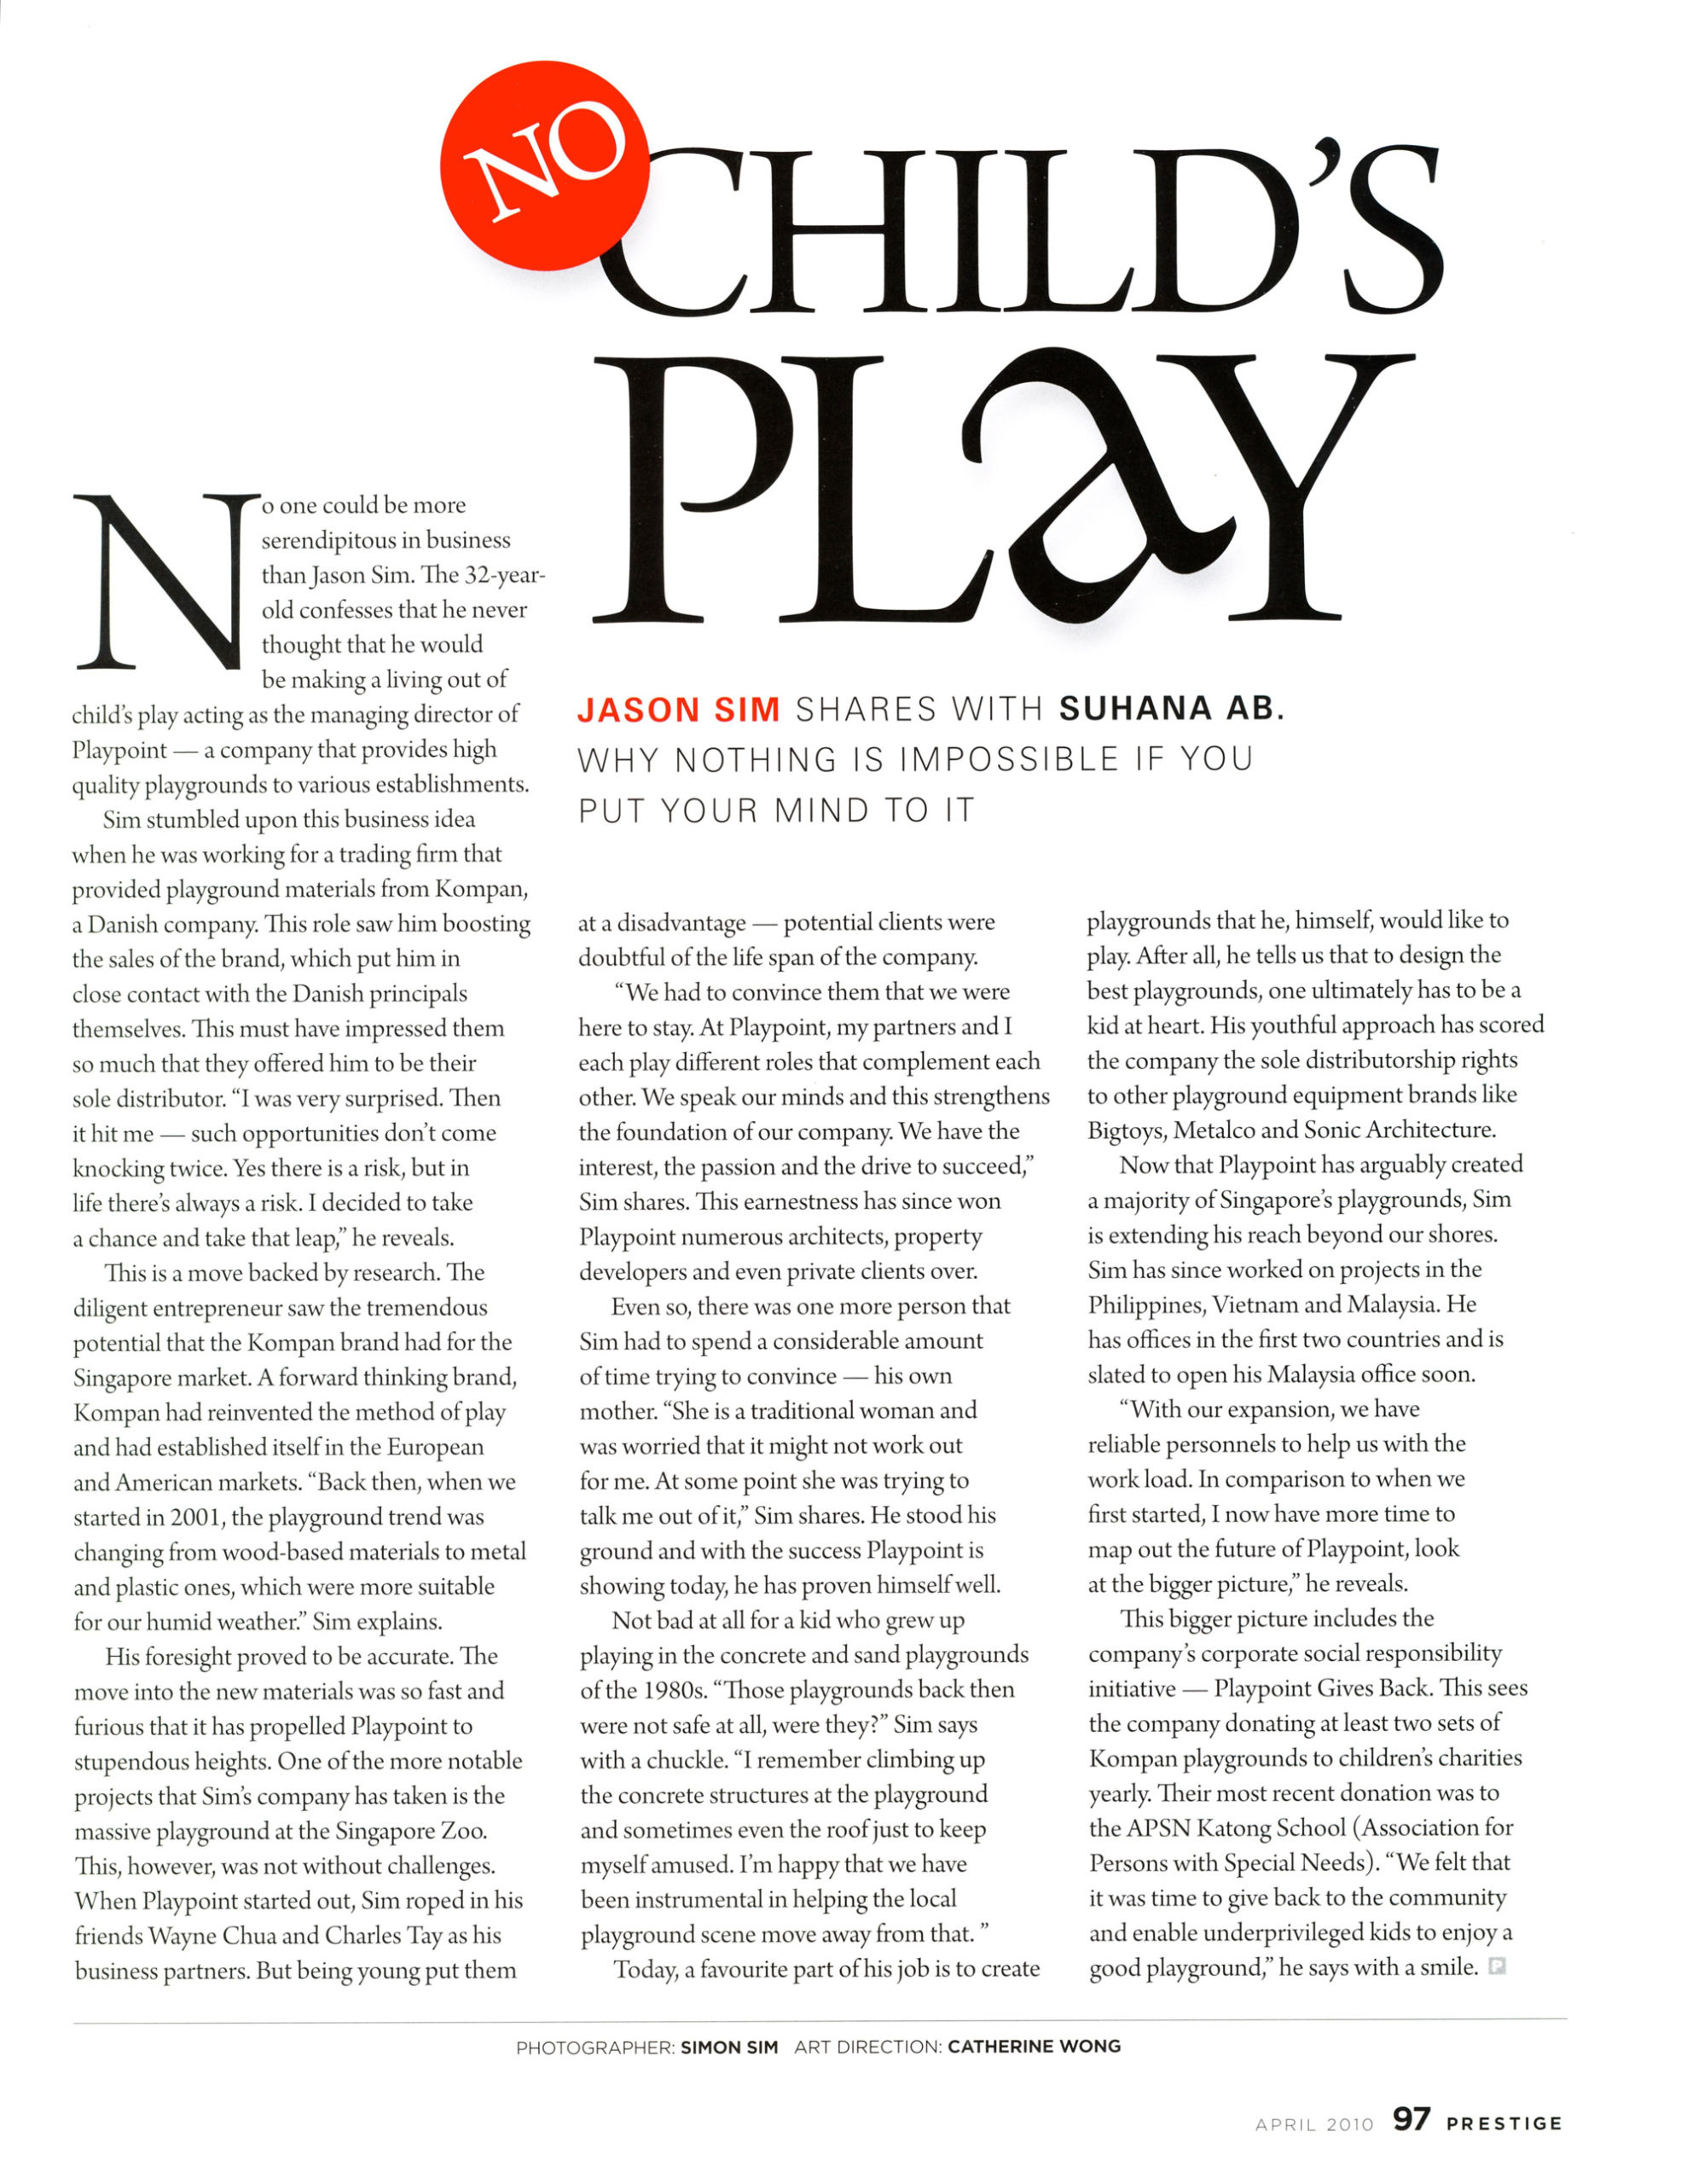 2010-04-Prestige-No-Childs-Play-scaled.jpg